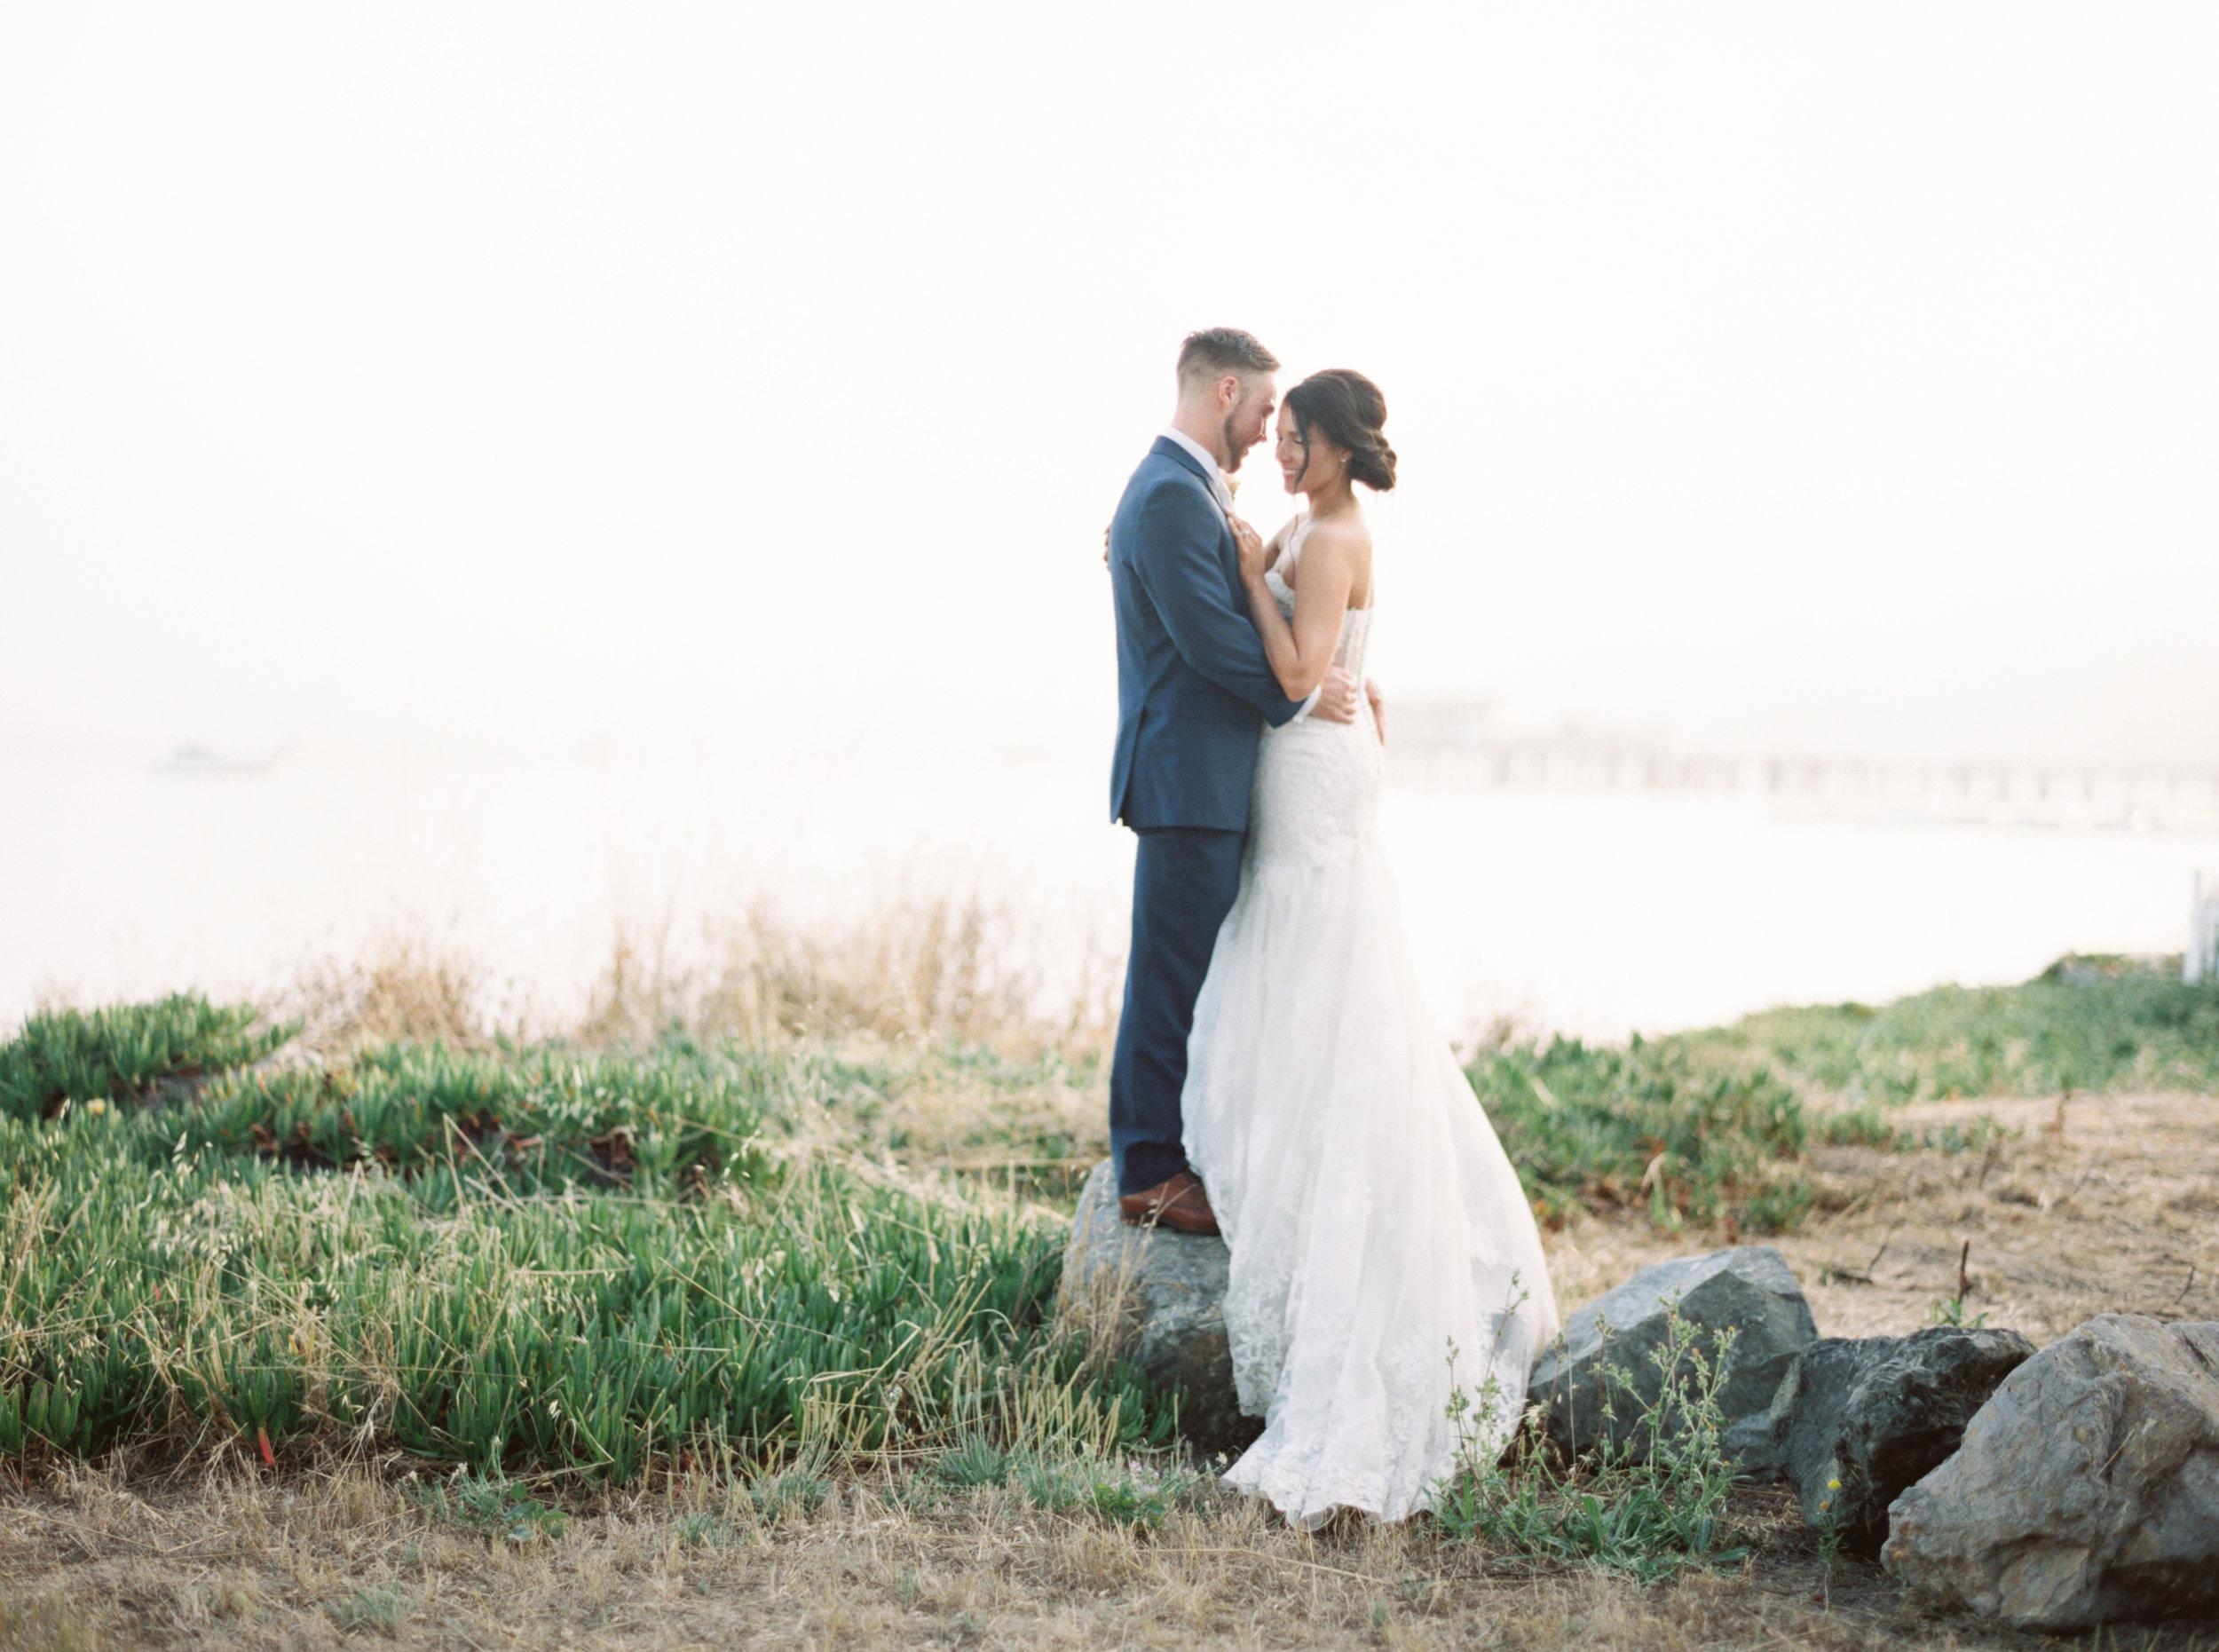 trynhphoto_socal_sf_halfmoon_bay_wedding_photographer_JA-574.jpg